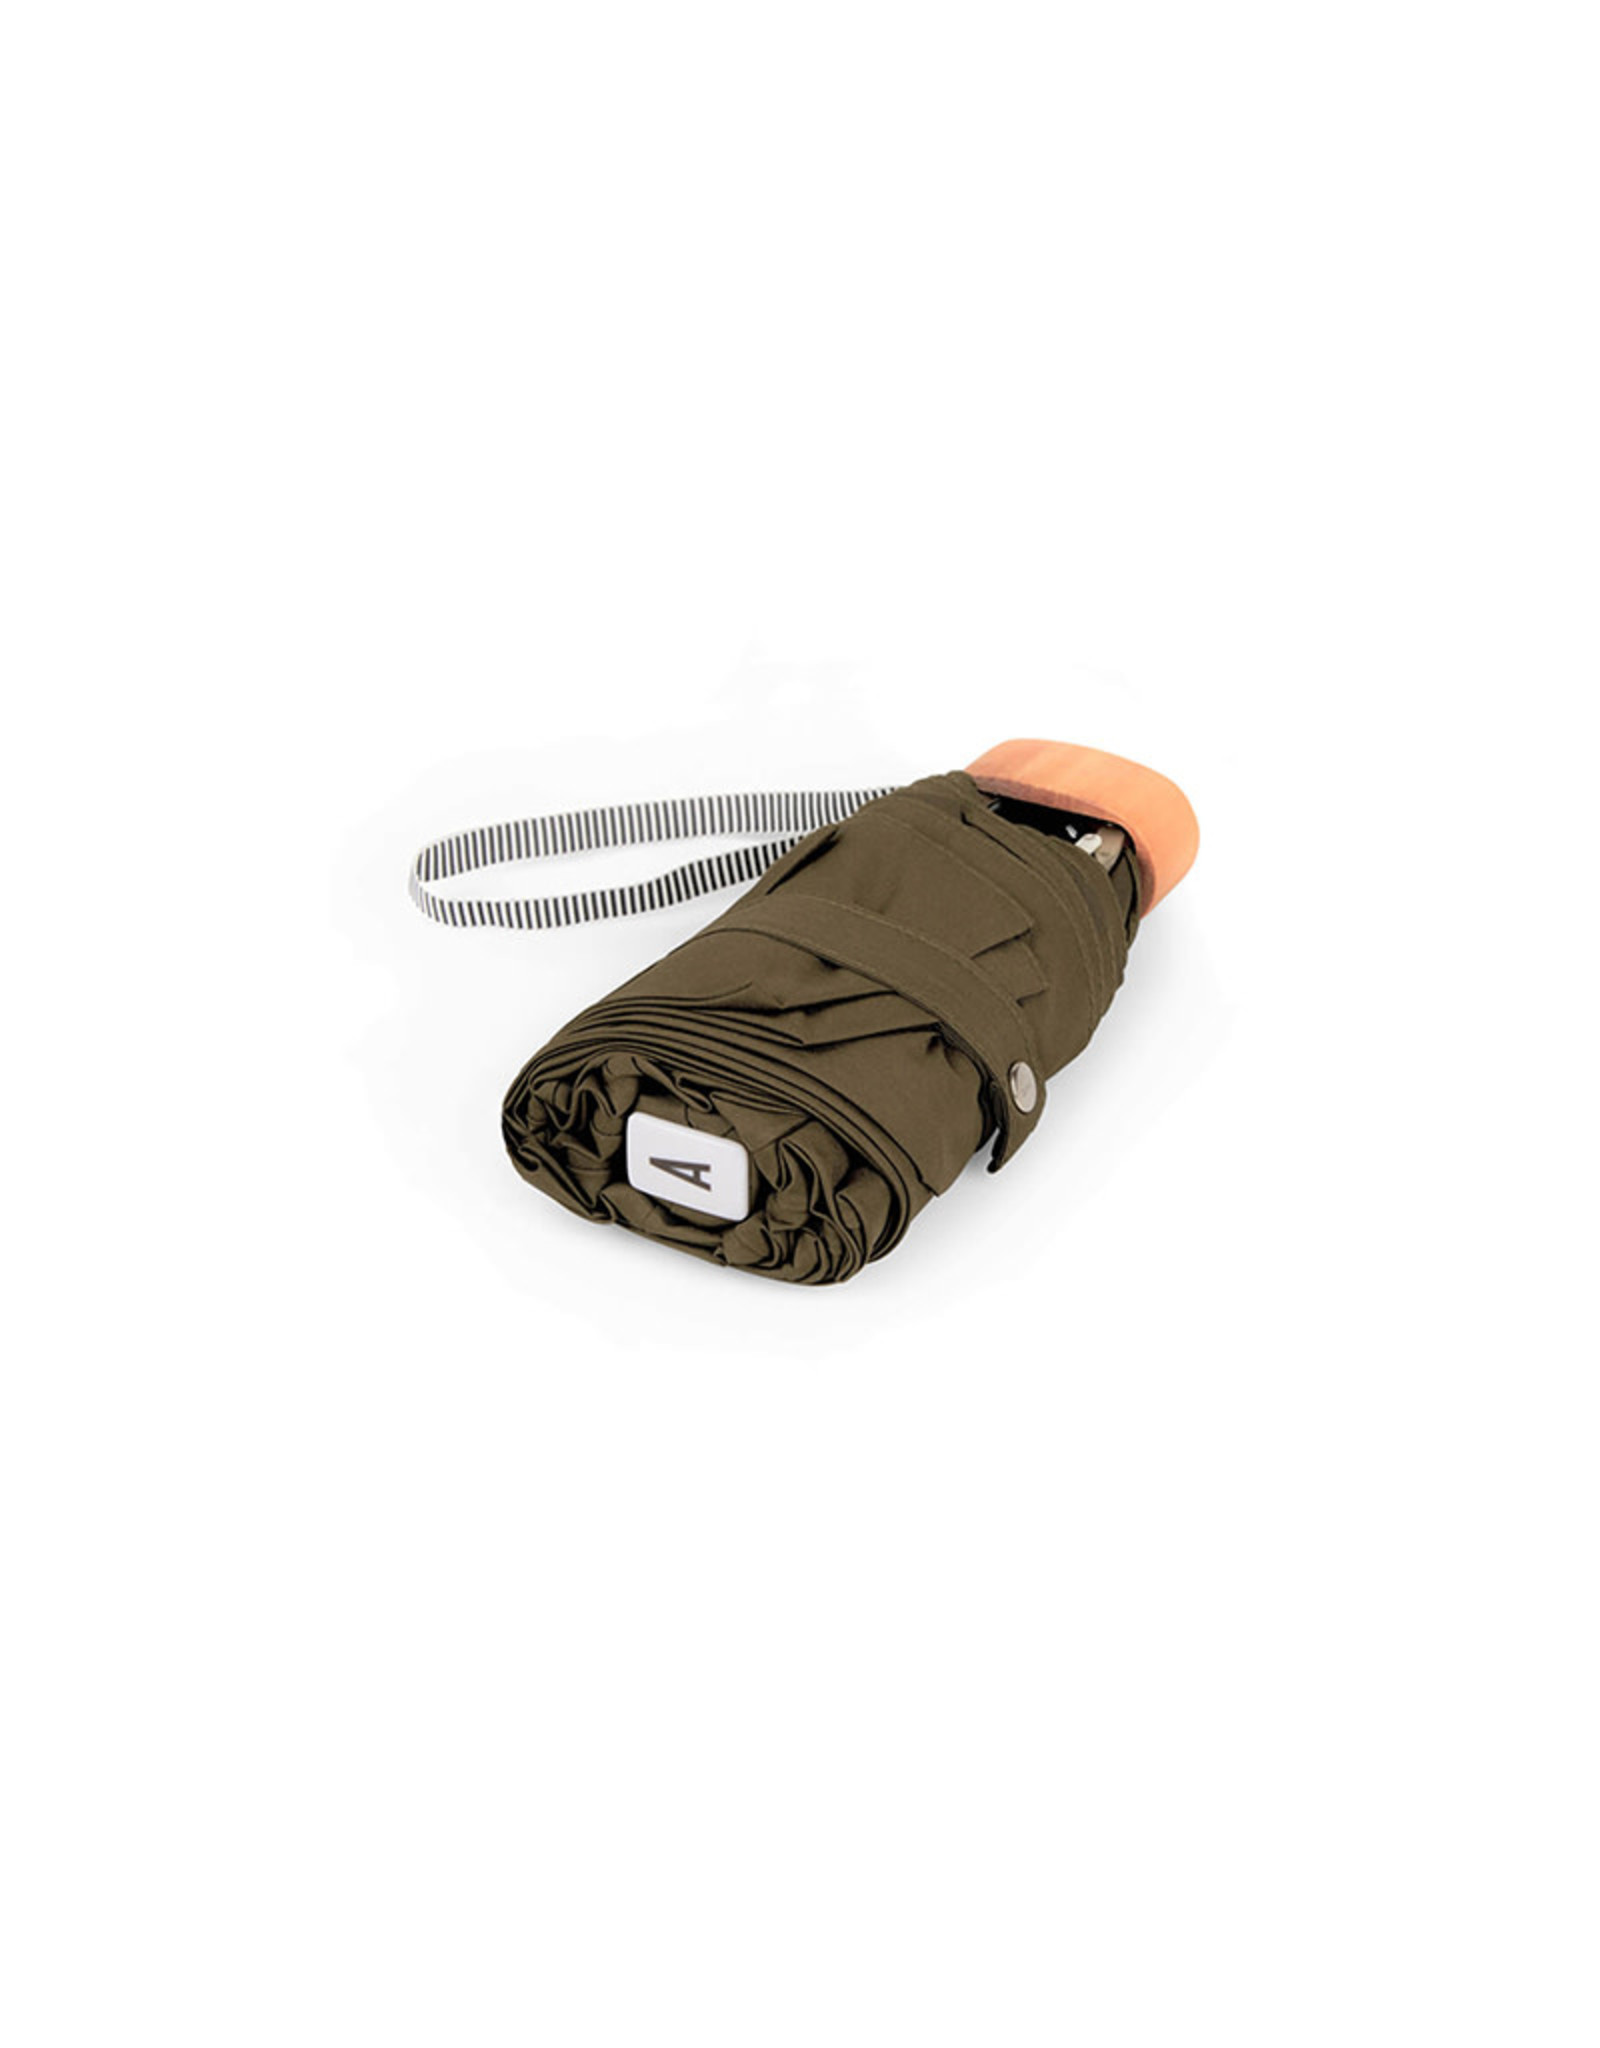 ANATOLE ANATOLE Folding Umbrella - Léonard - Khaki